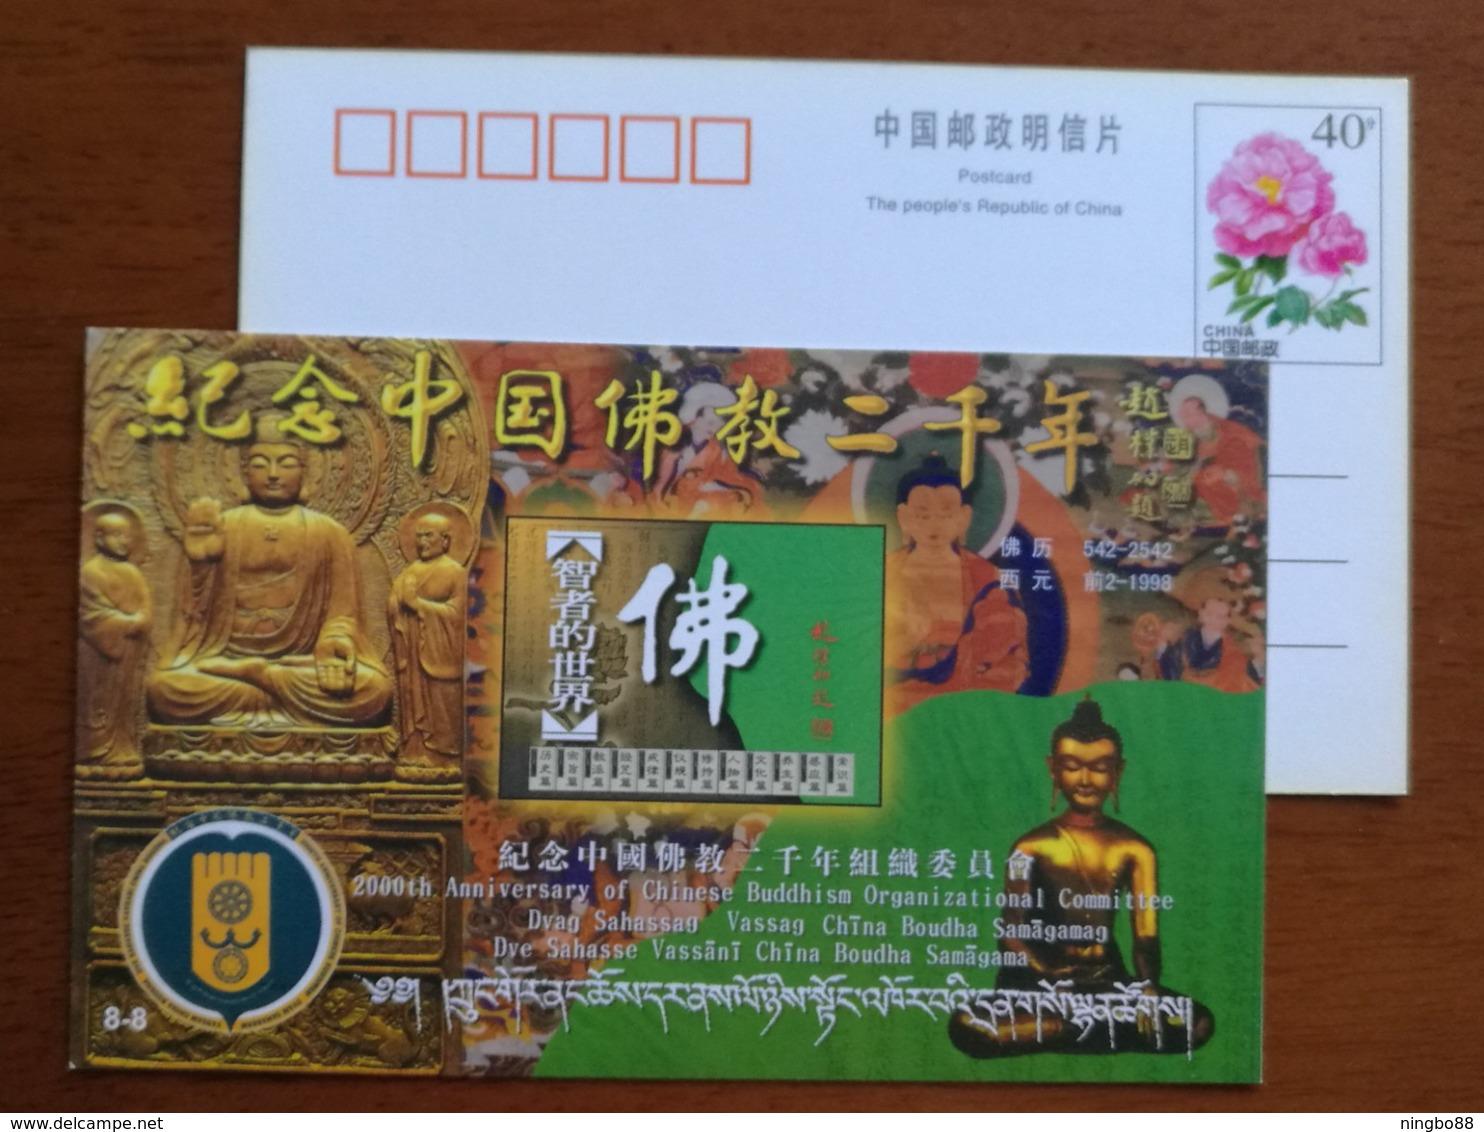 Buddhism The World Of The Wise,Buddha Statue,Sanskrit Language,CN98 The 2000th Anniversary Of Chinese Buddhism PSC - Buddhism